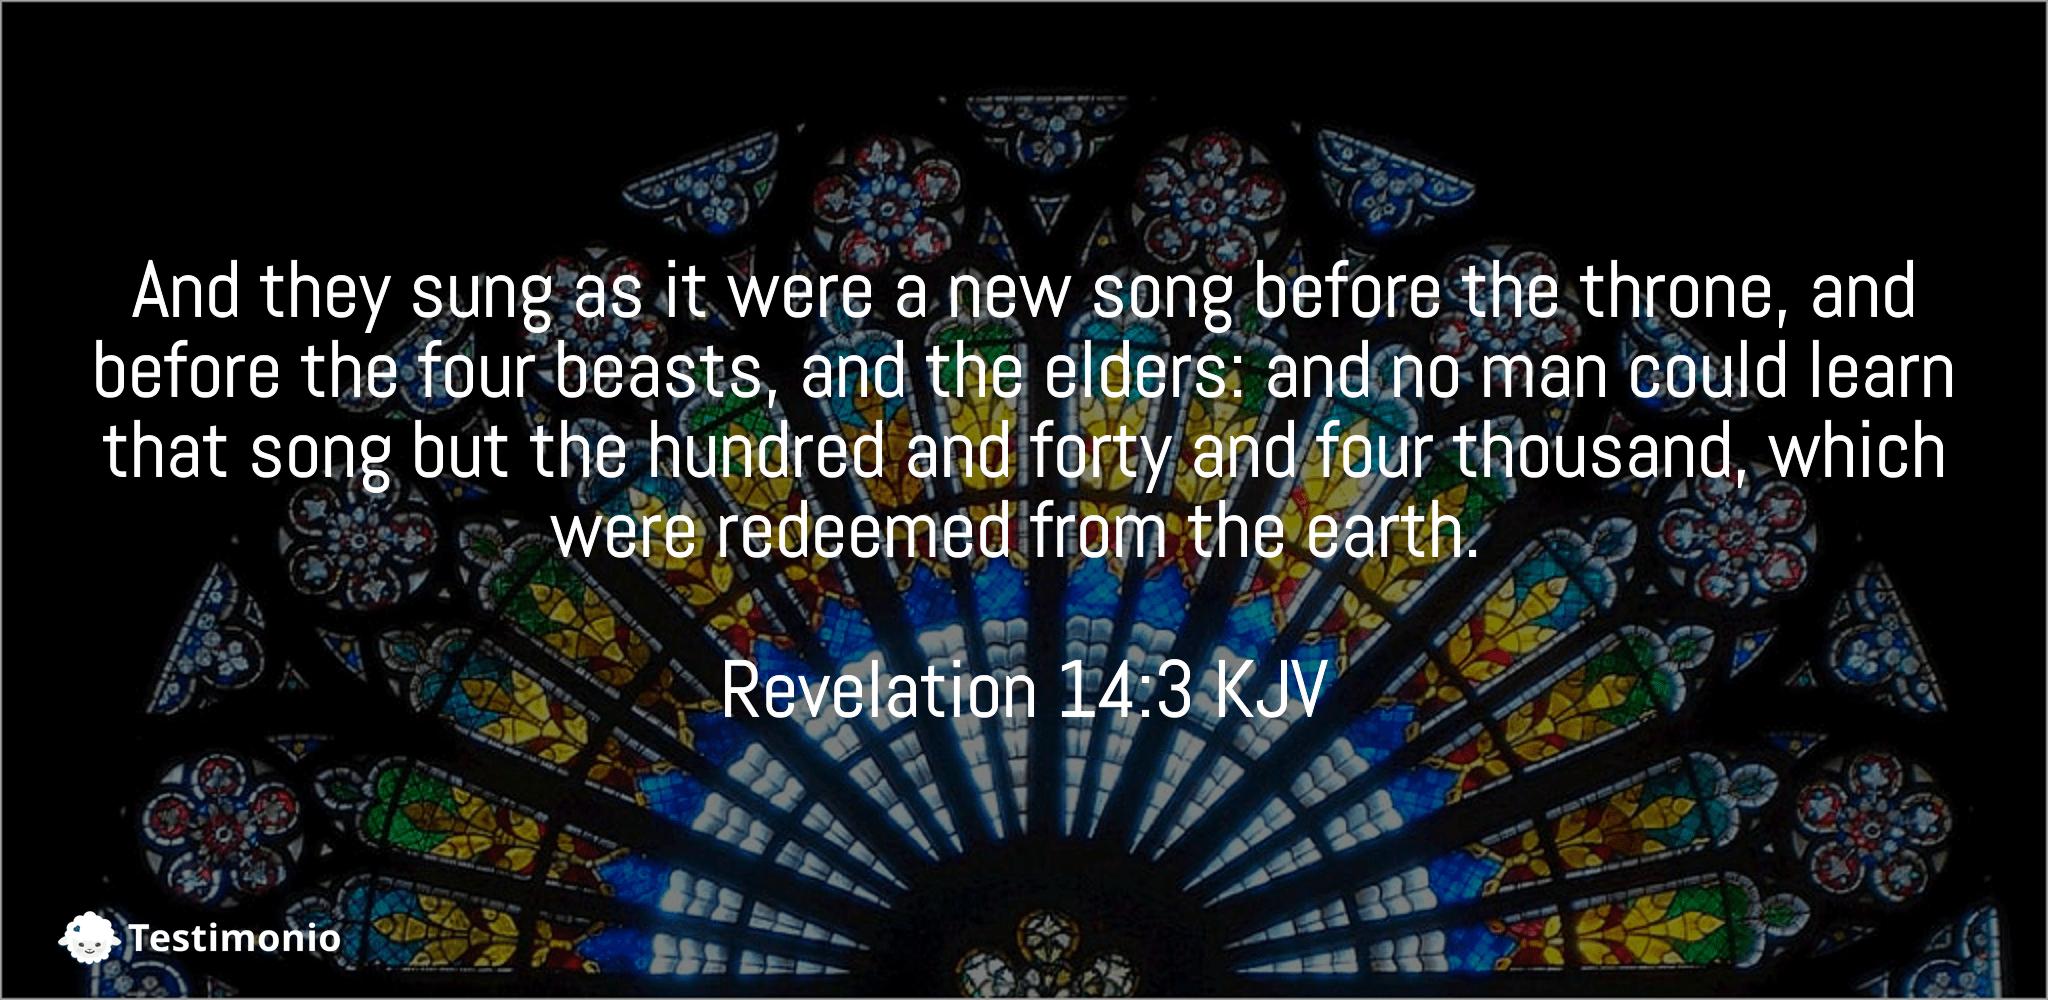 Revelation 14:3